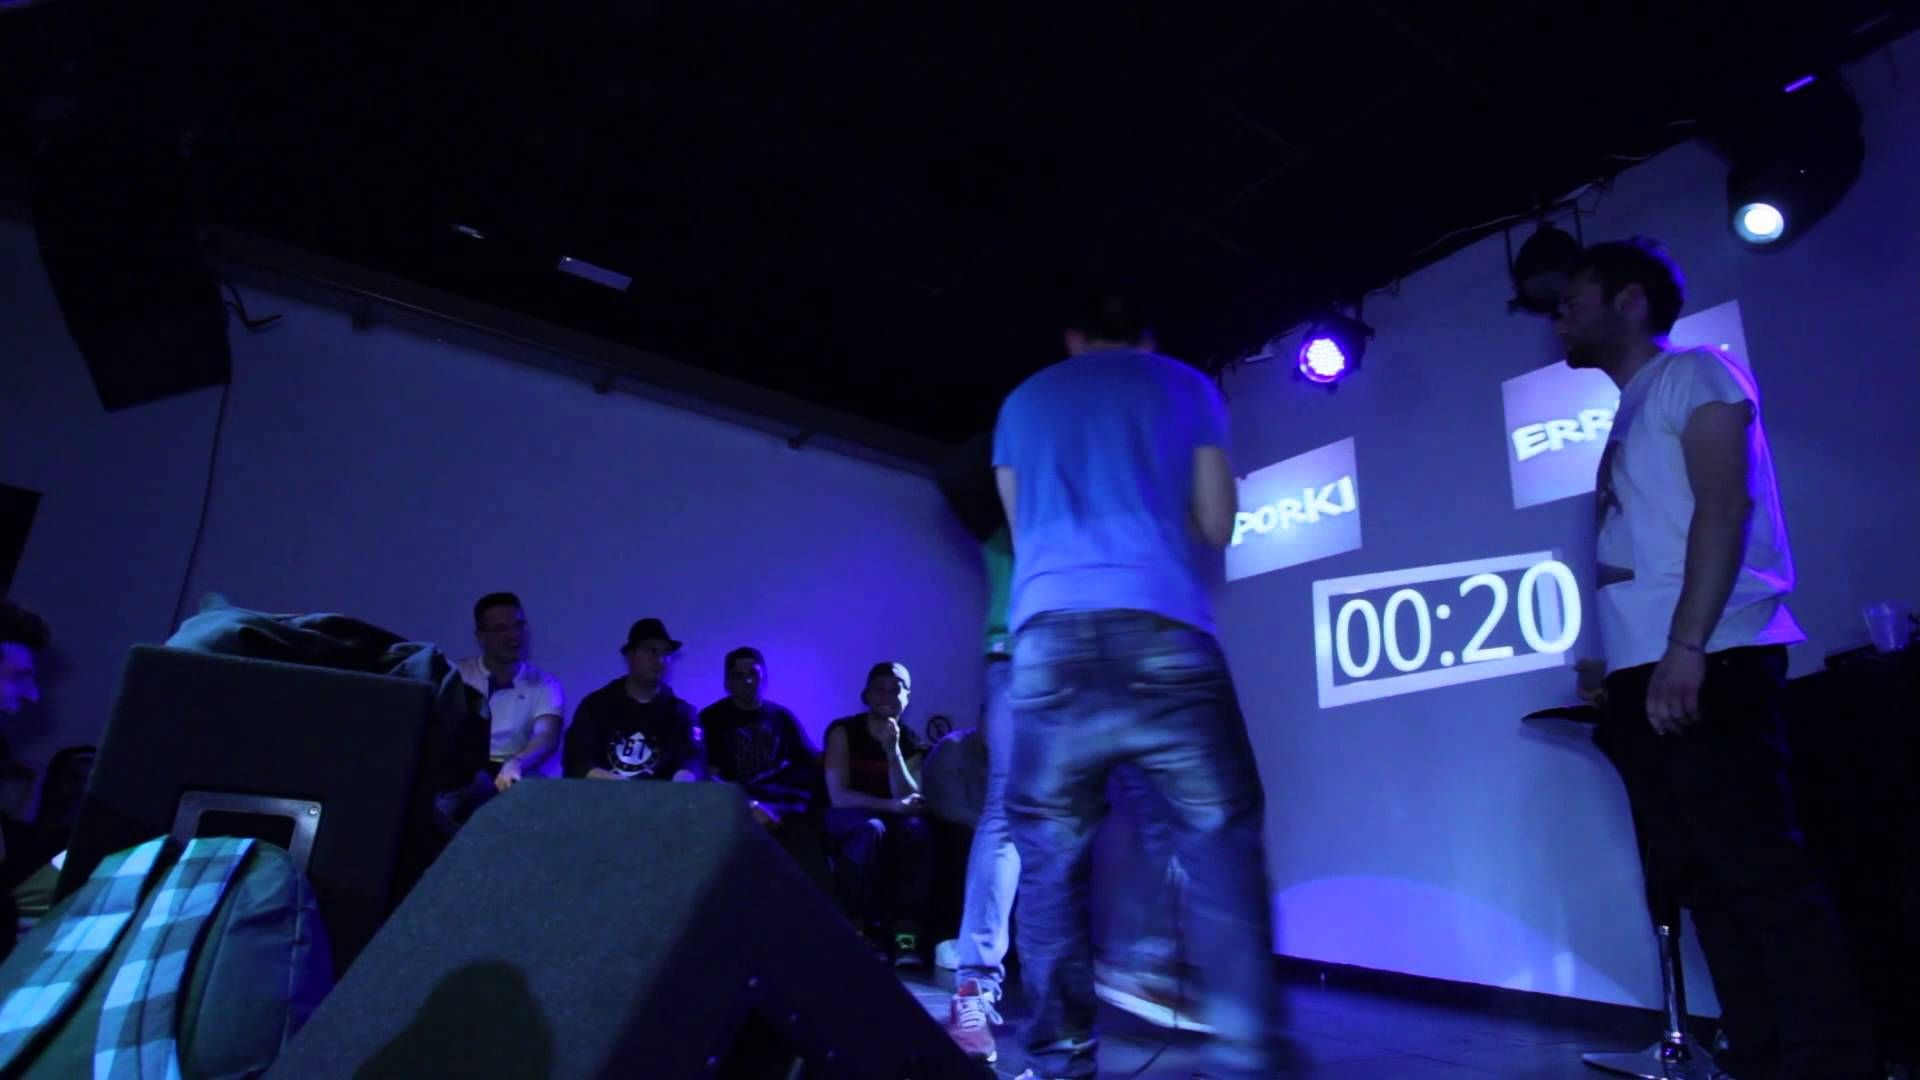 Porky930 vs Errece (3º y 4º Puesto) – Gold Battle 2015 Regional Valencia -  Porky930 vs Errece (3º y 4º Puesto) – Gold Battle 2015 Regional Valencia - http://batallasderap.net/porky930-vs-errece-3o-y-4o-puesto-gold-battle-2015-regional-valencia/  #rap #hiphop #freestyle